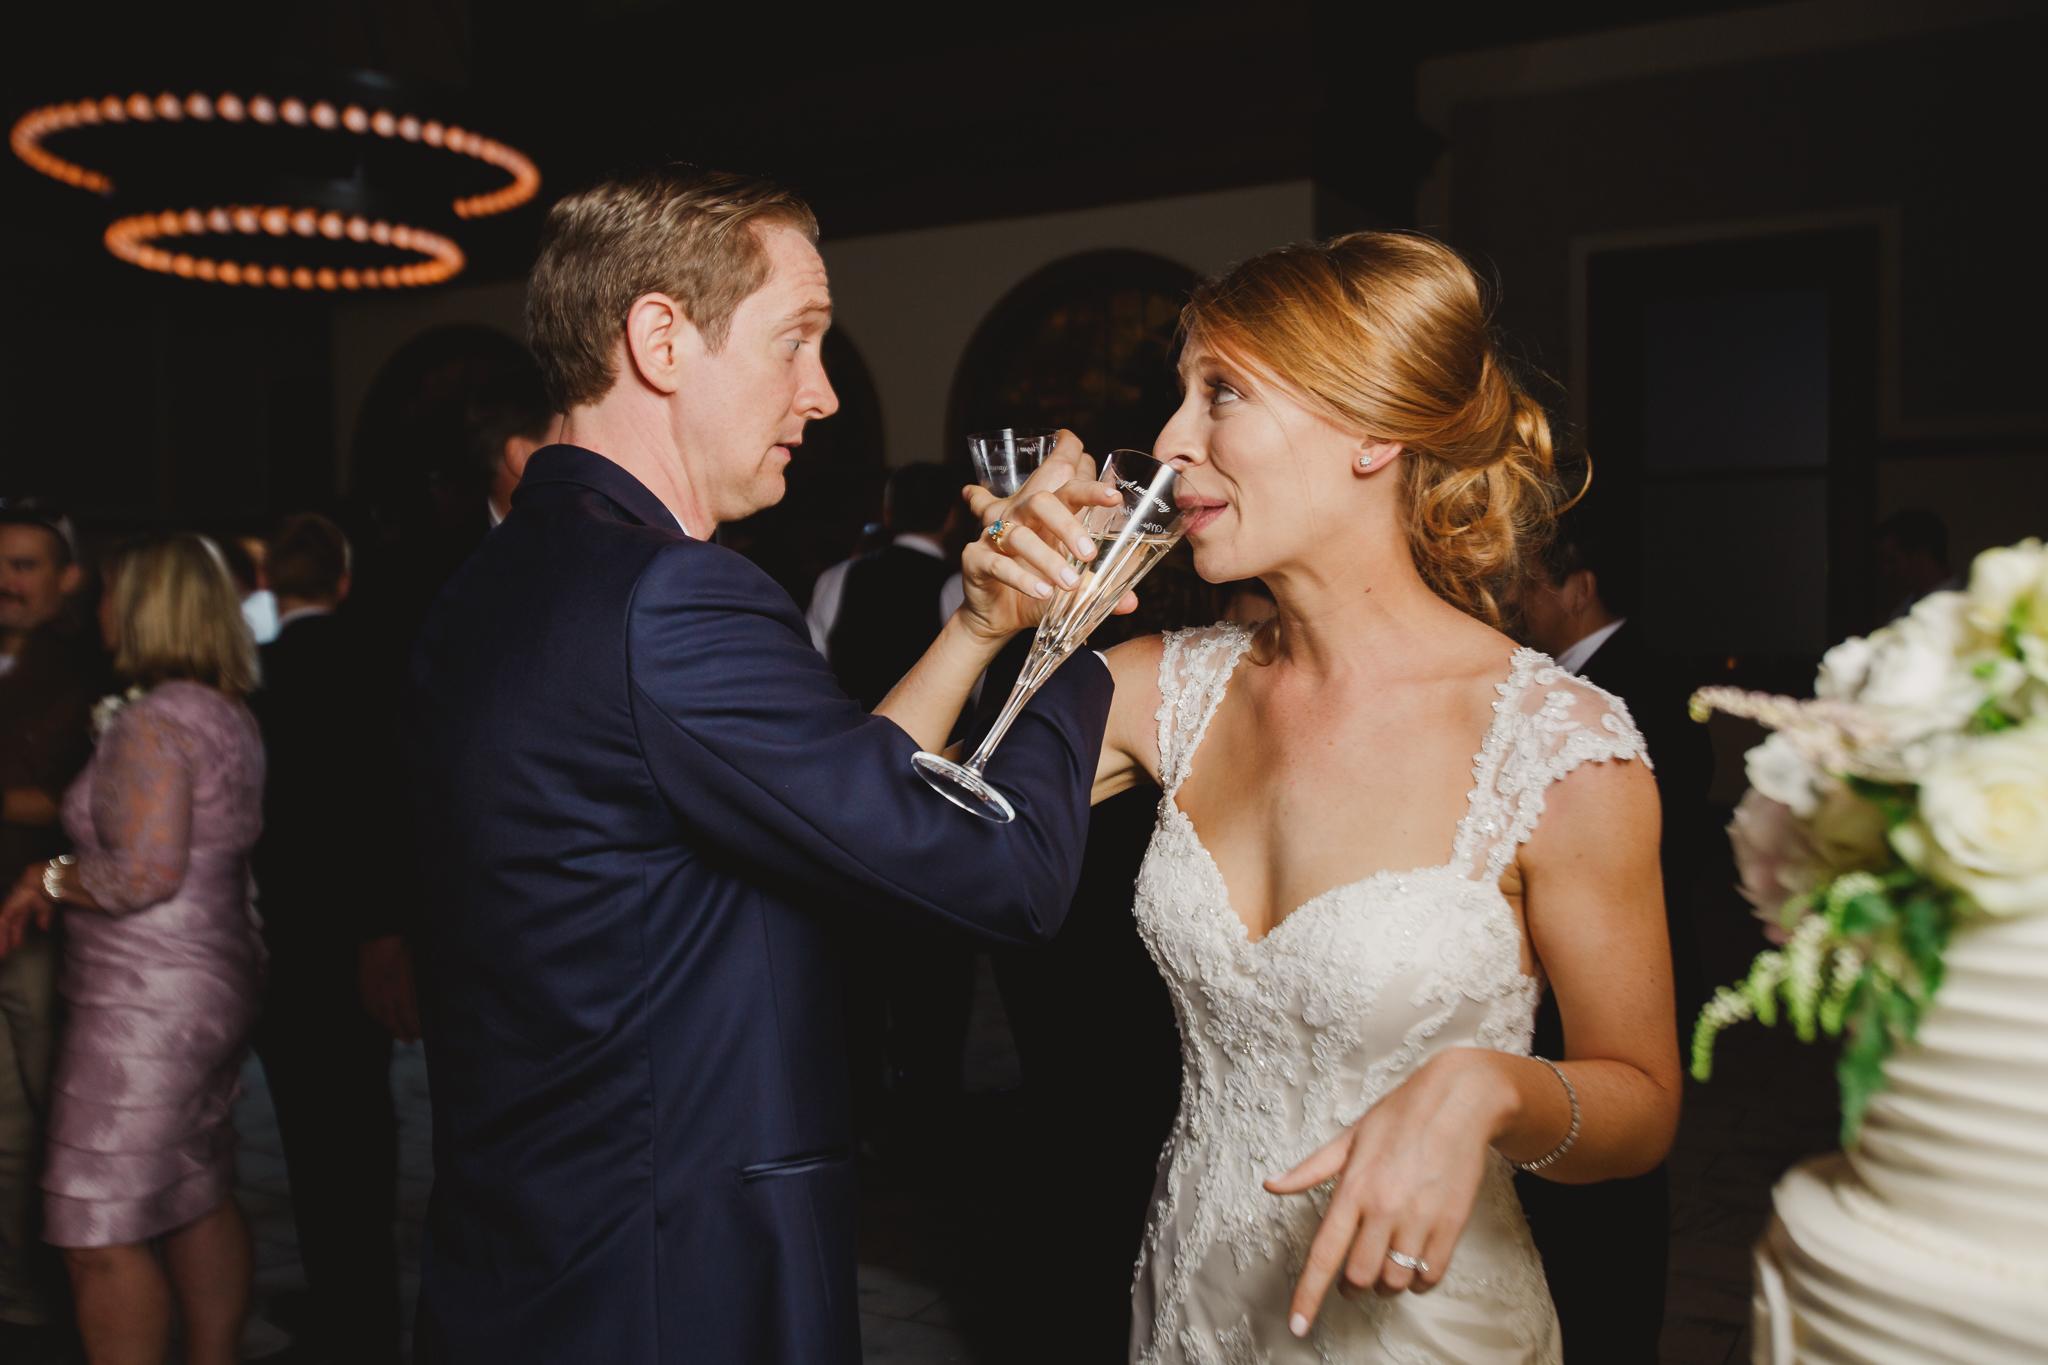 Michael and Kelly - the ashton depot - wedding DFW - wedding photographer- elizalde photography (122 of 150).jpg